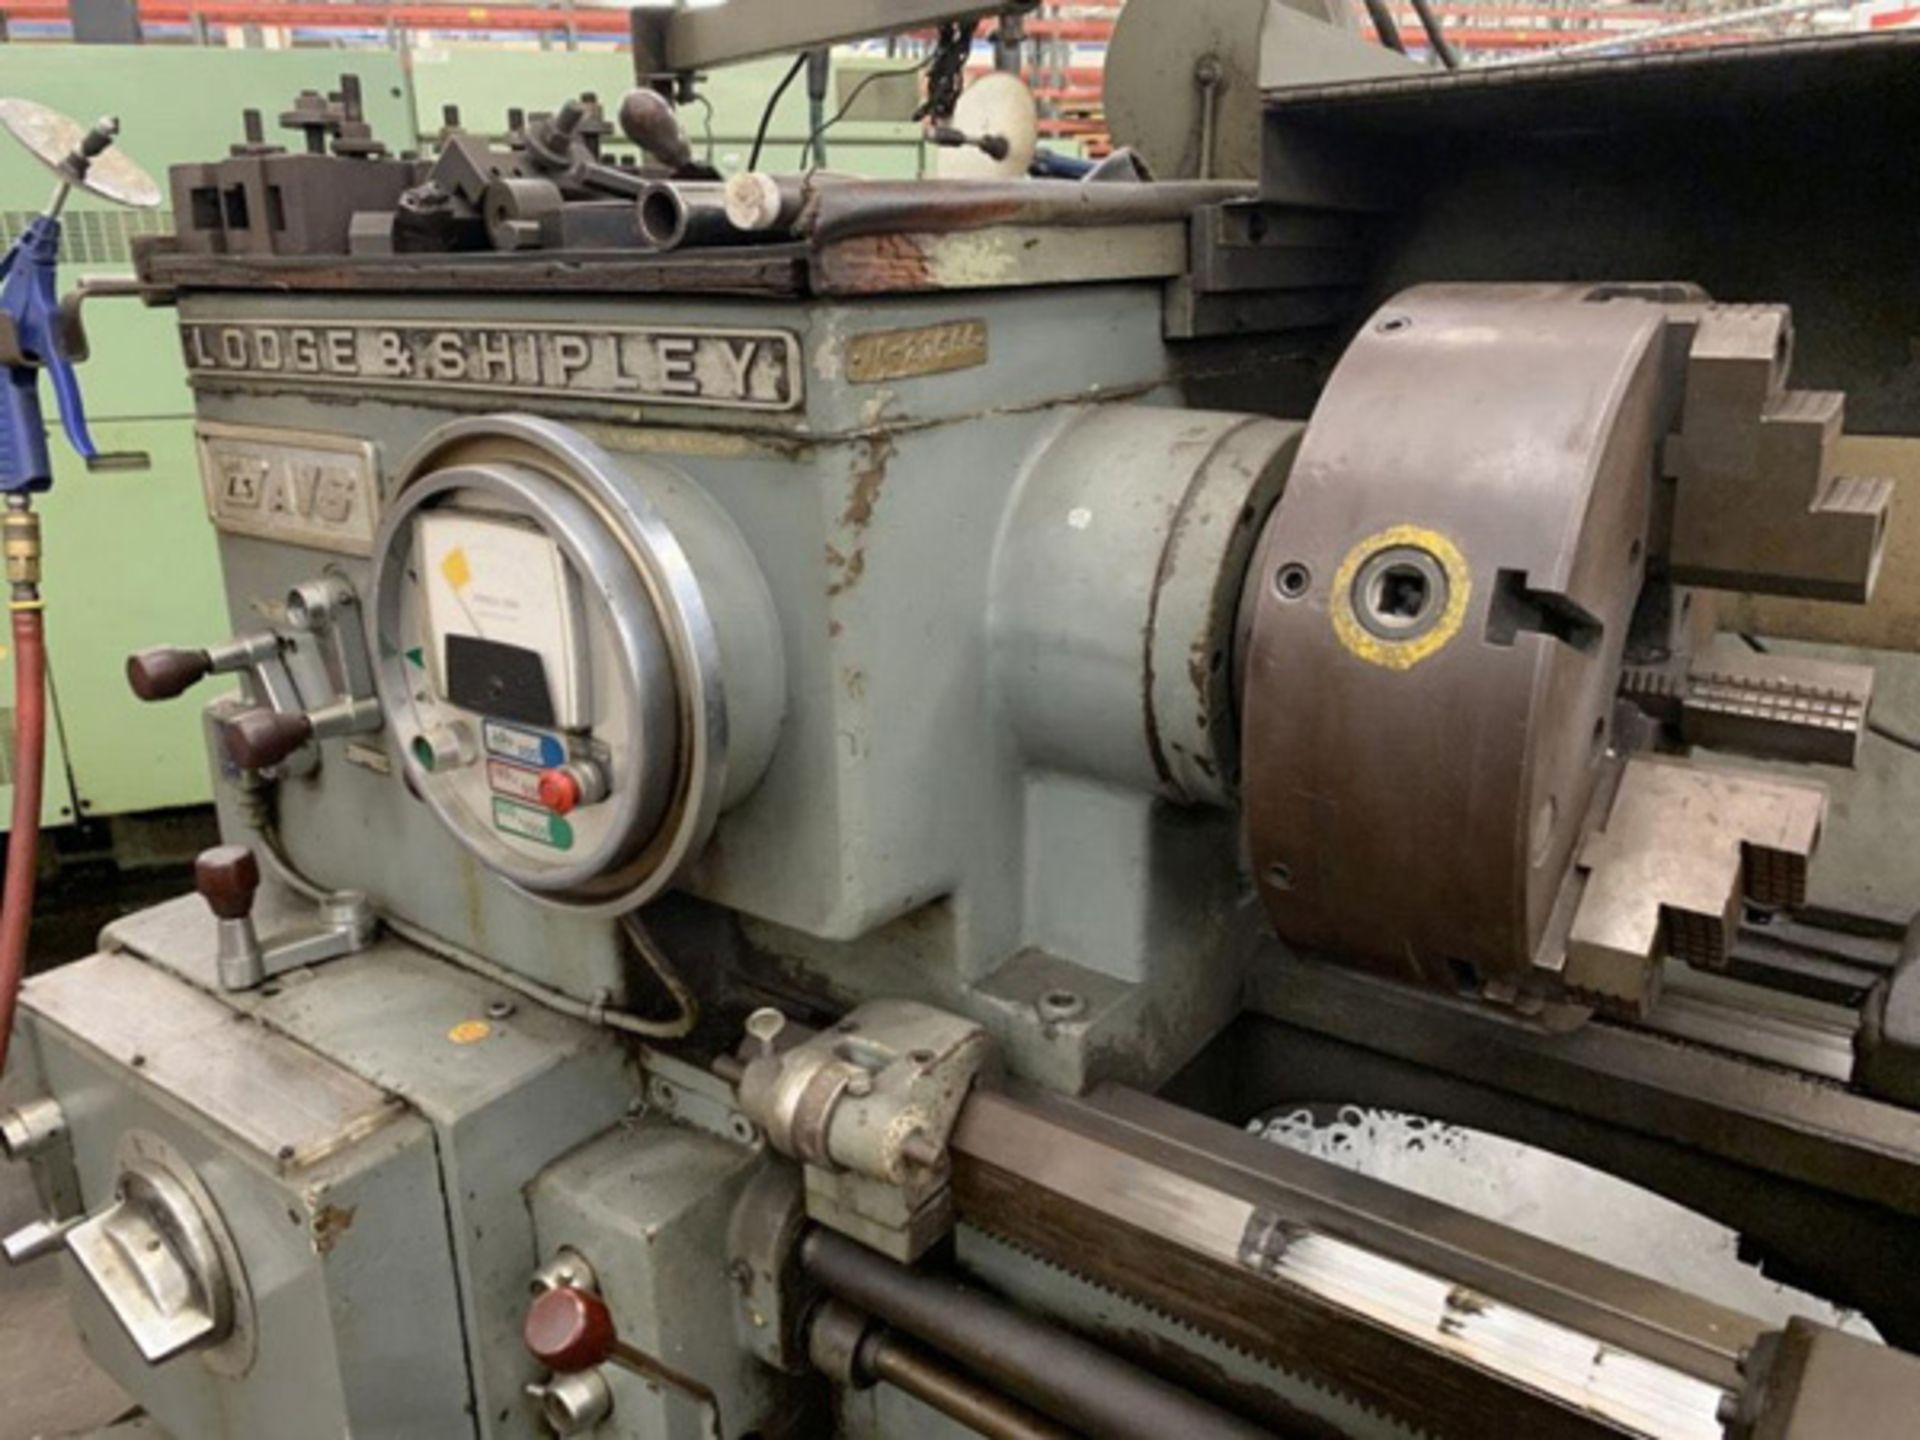 "Lot 19 - Lodge & Shipley Engine Lathe | 20"" x 78"", Mdl: AVS 2013, S/N: 49393 - 8384P"